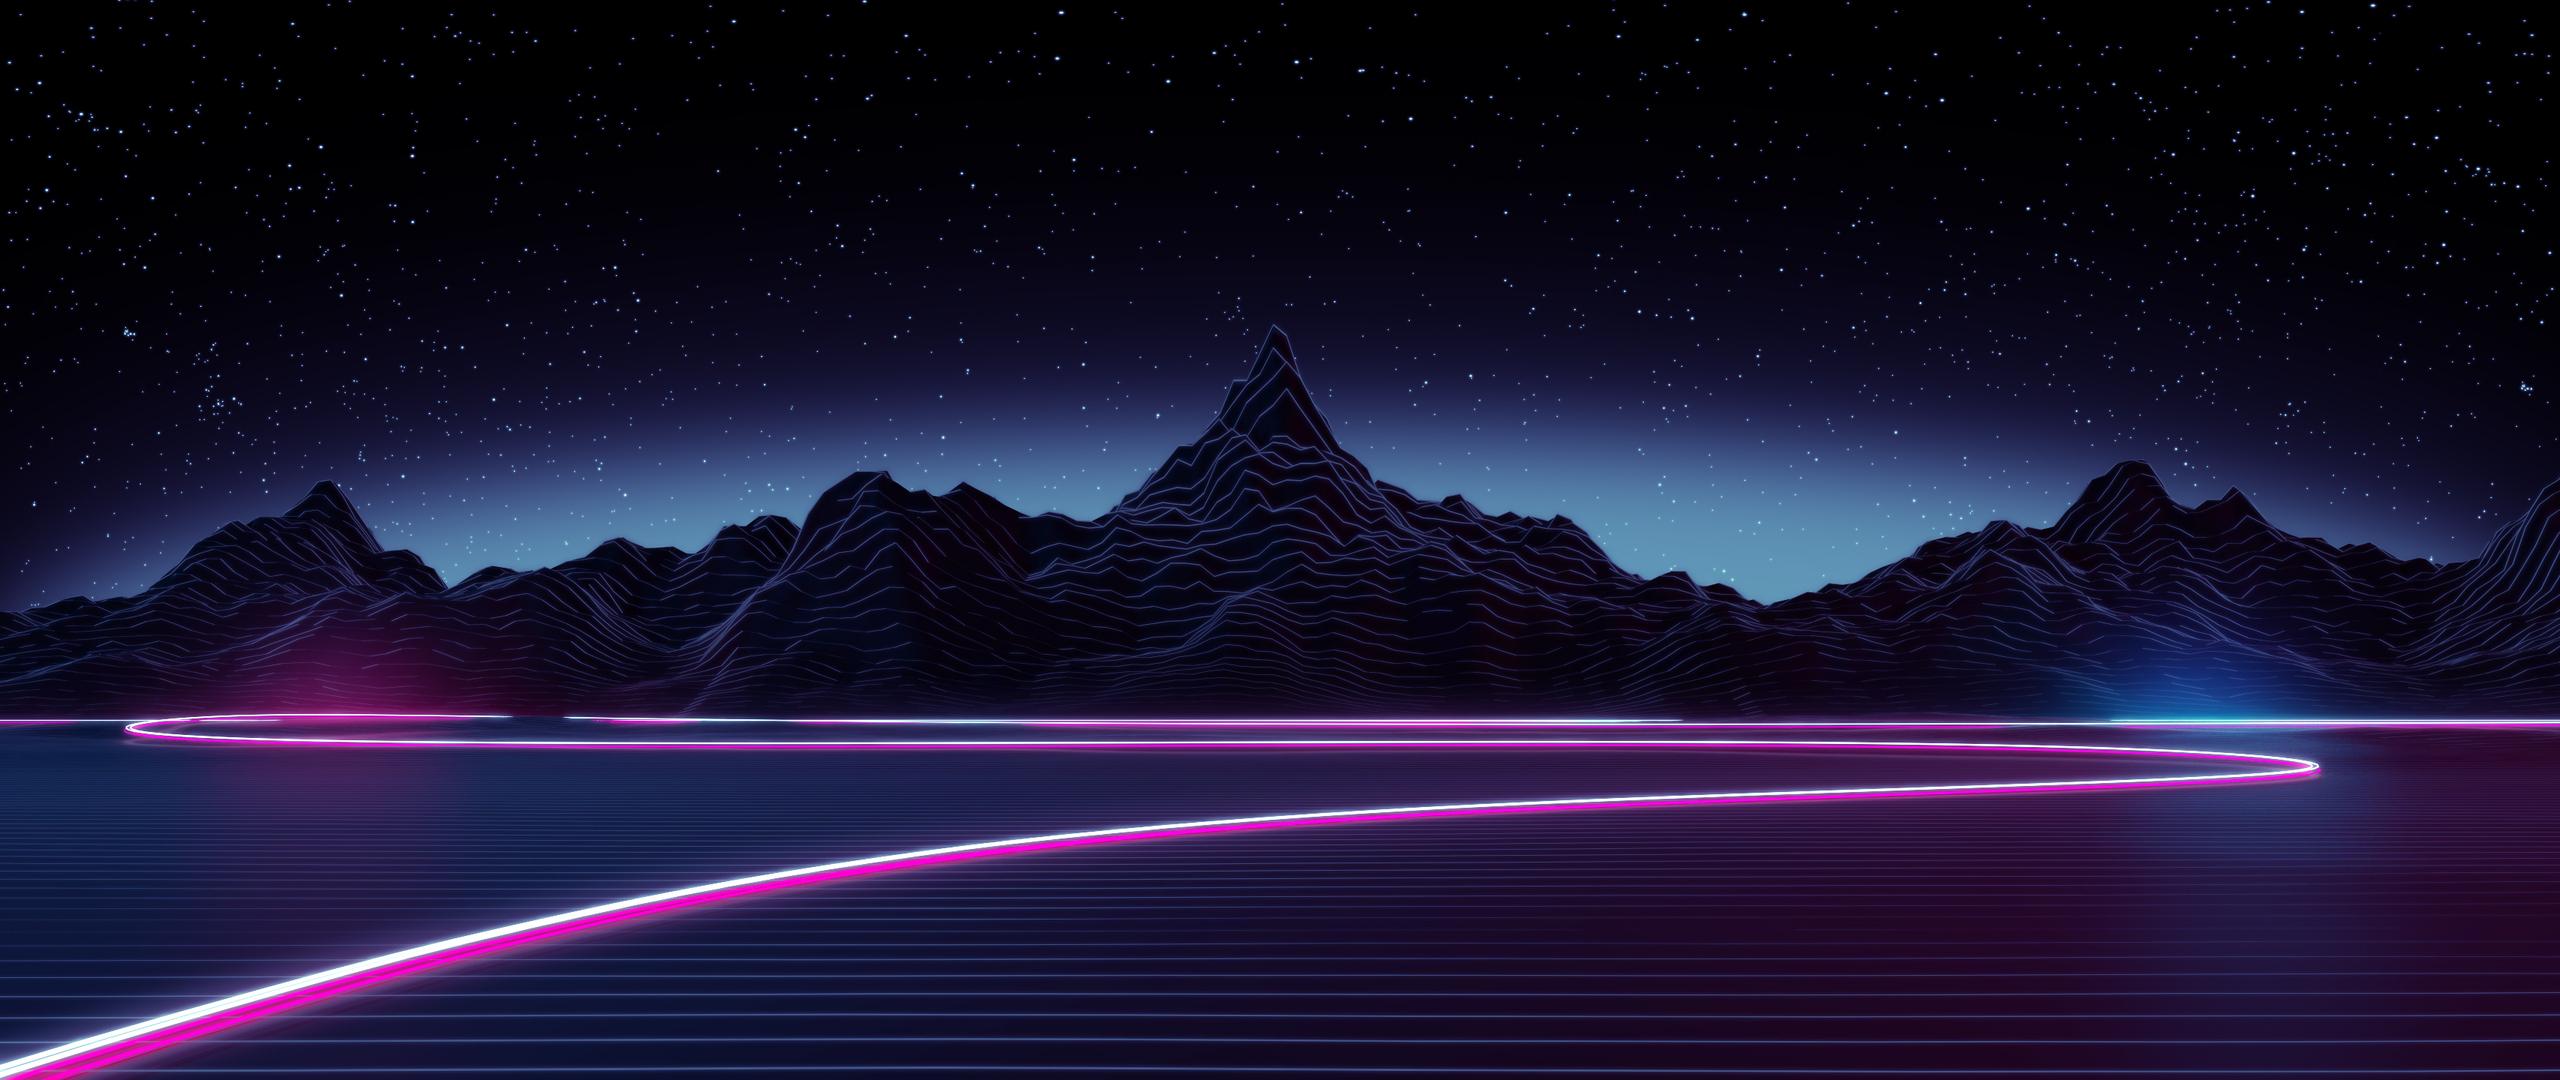 2560x1080 Neon Highway Digital Art 2560x1080 Resolution HD ...